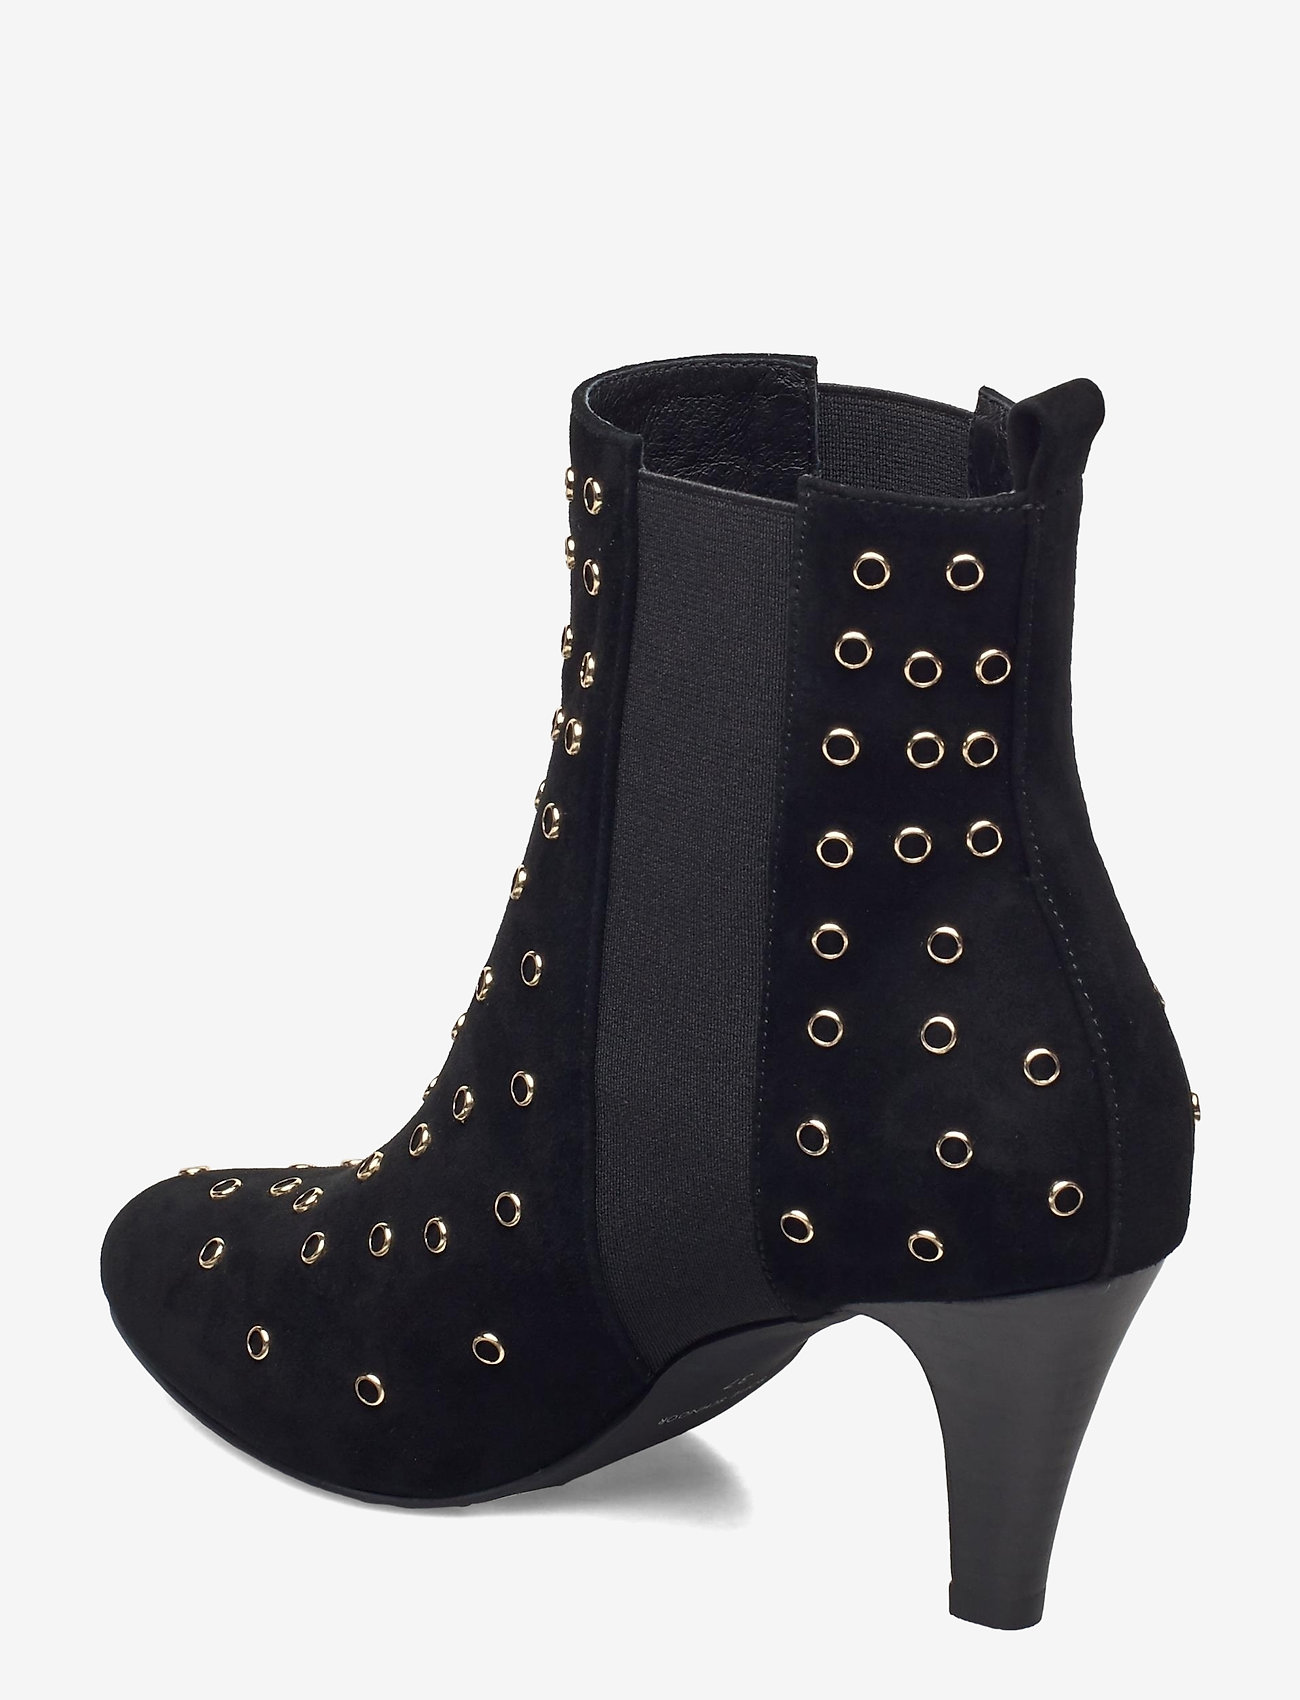 Boot 7 Cm (Black) (133.22 €) - Sofie Schnoor DXM8V